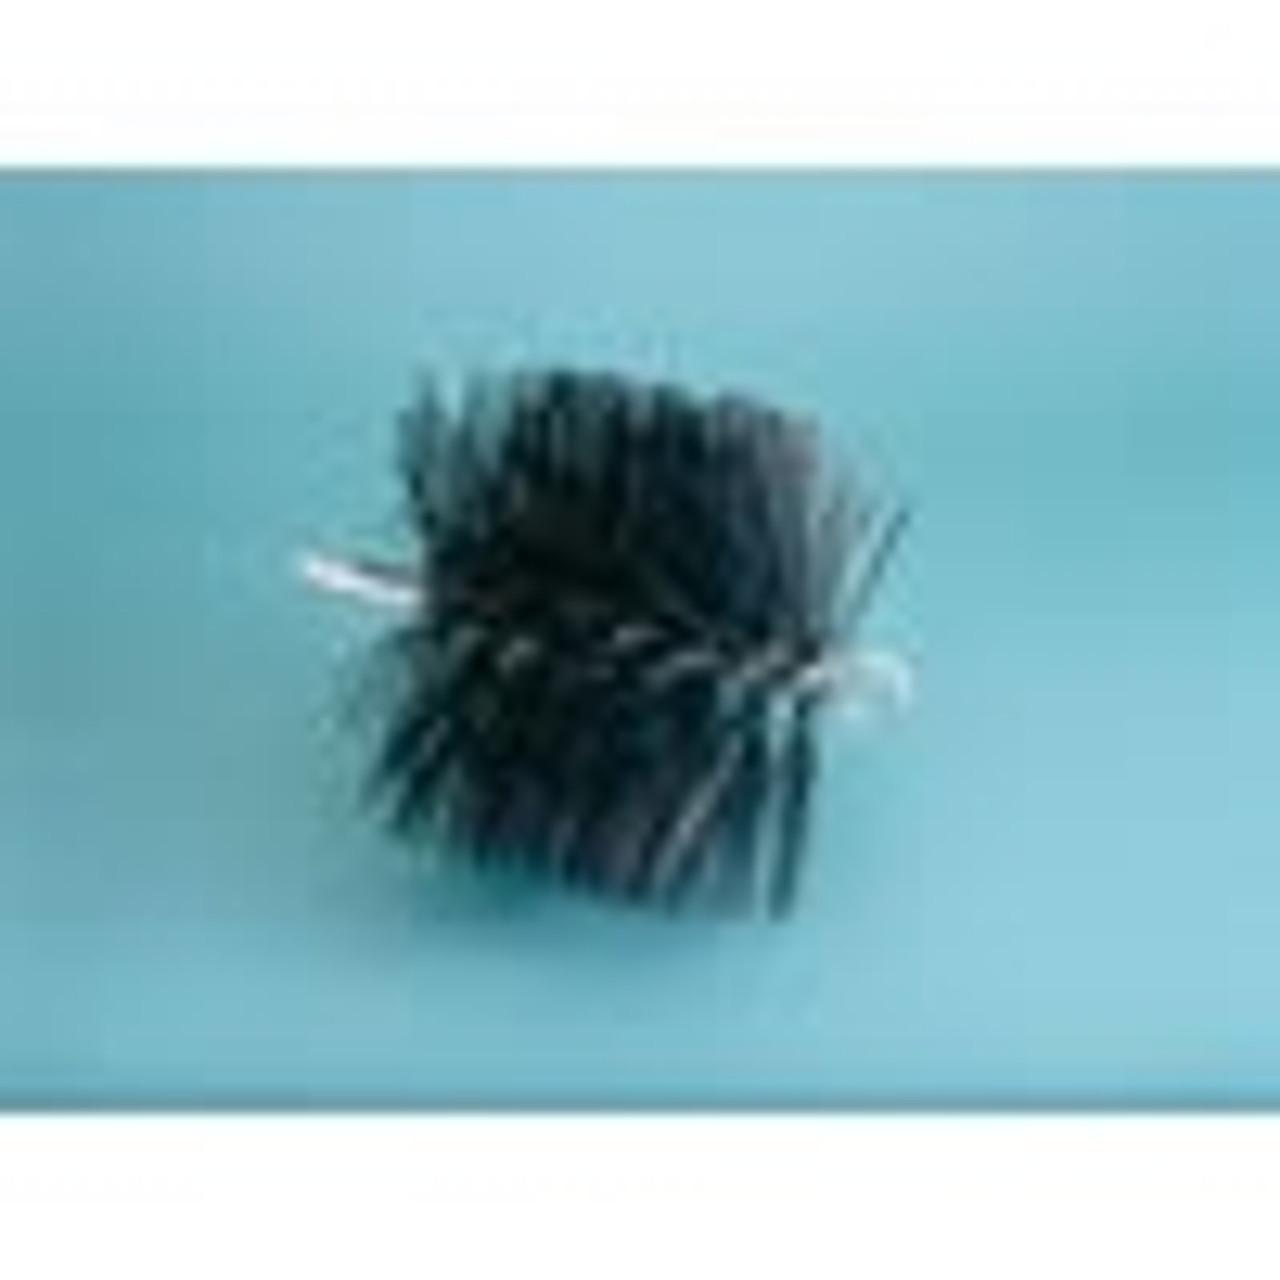 Chimney Brushes & Rods